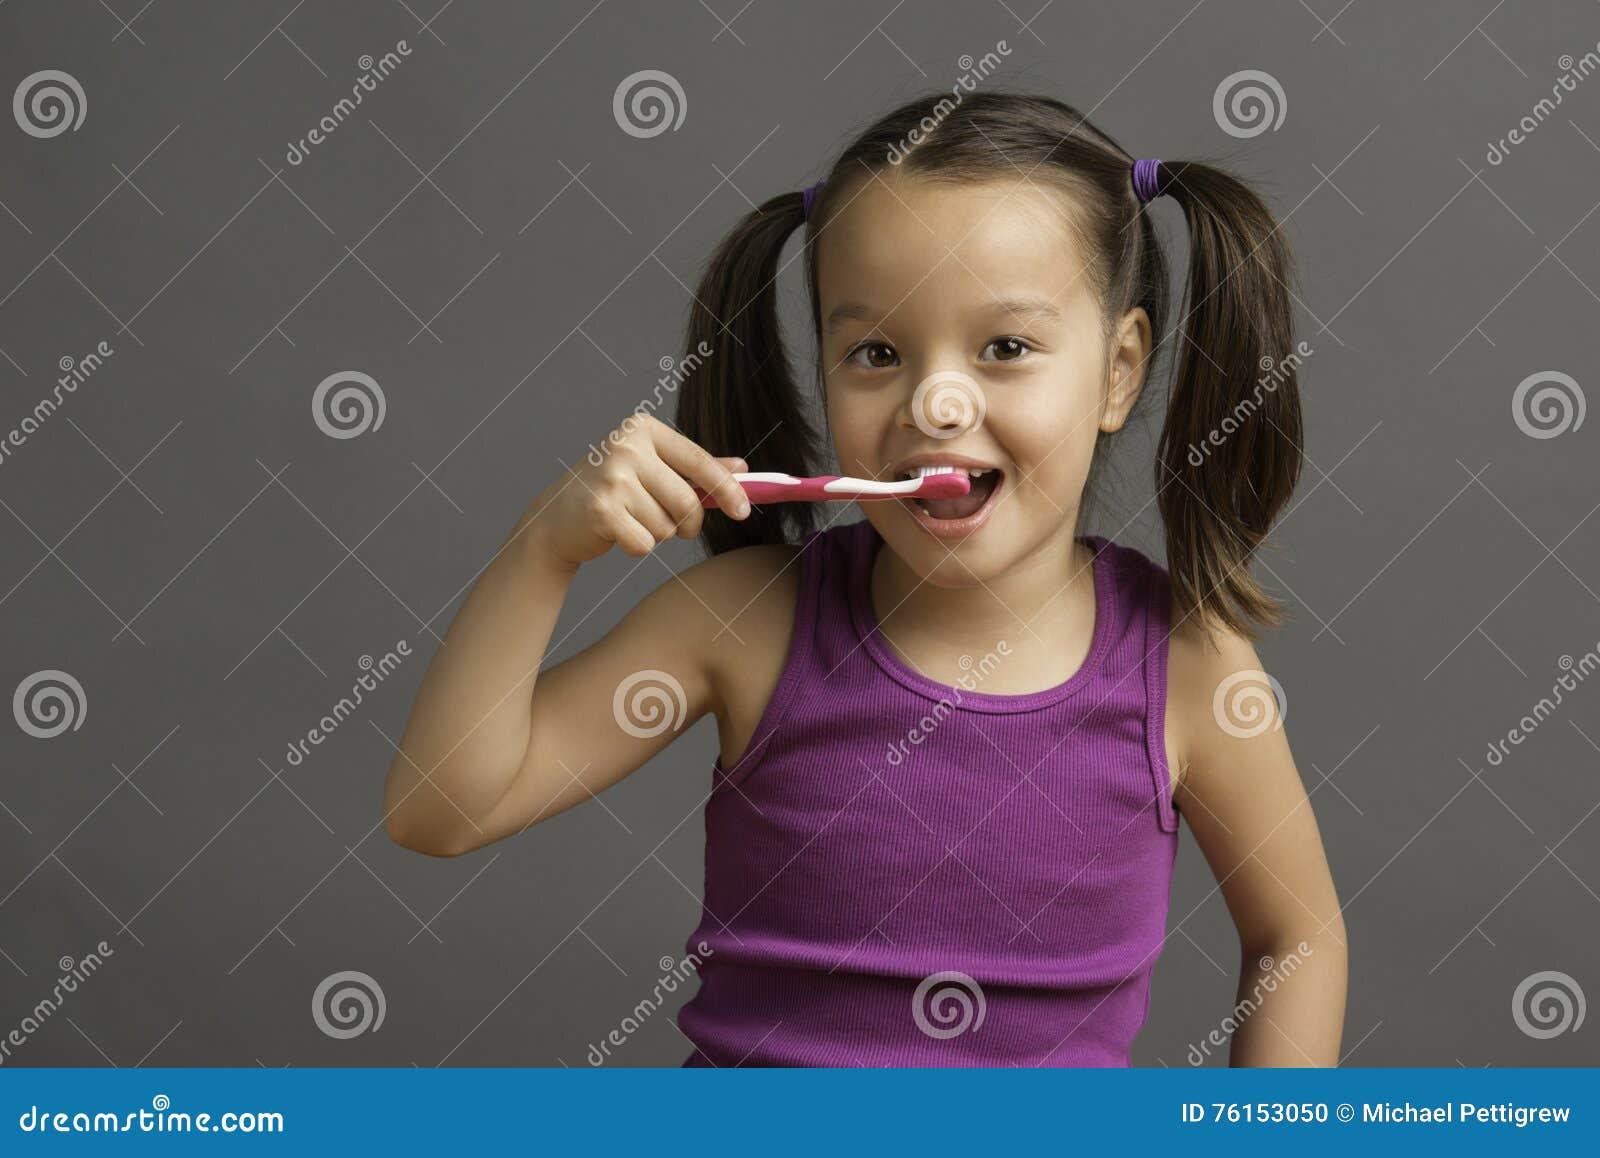 5 year old kid brushing her teeth